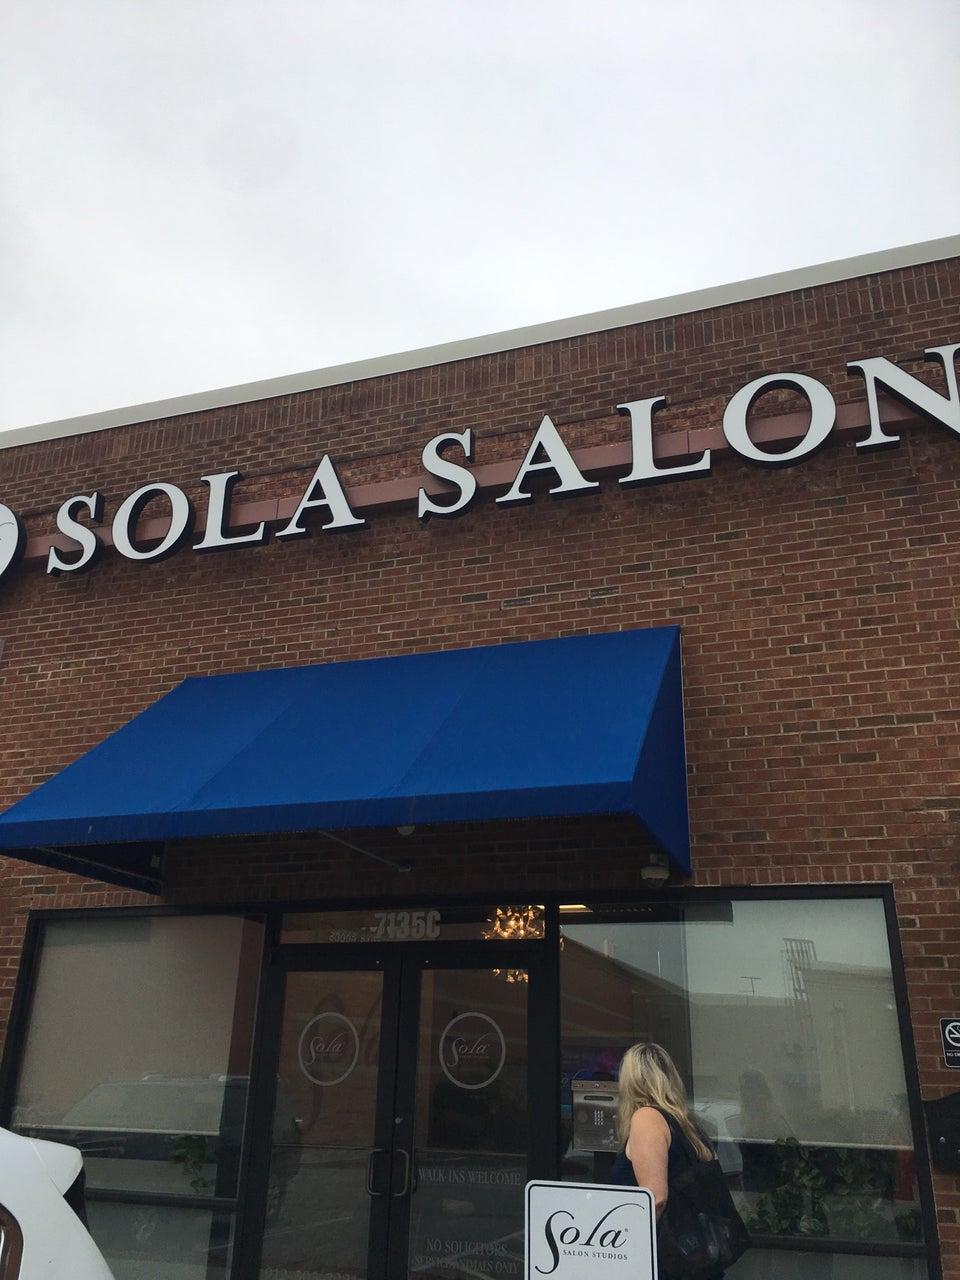 Sola Salon 7135 Hodgson Memorial Dr Unit C, Savannah